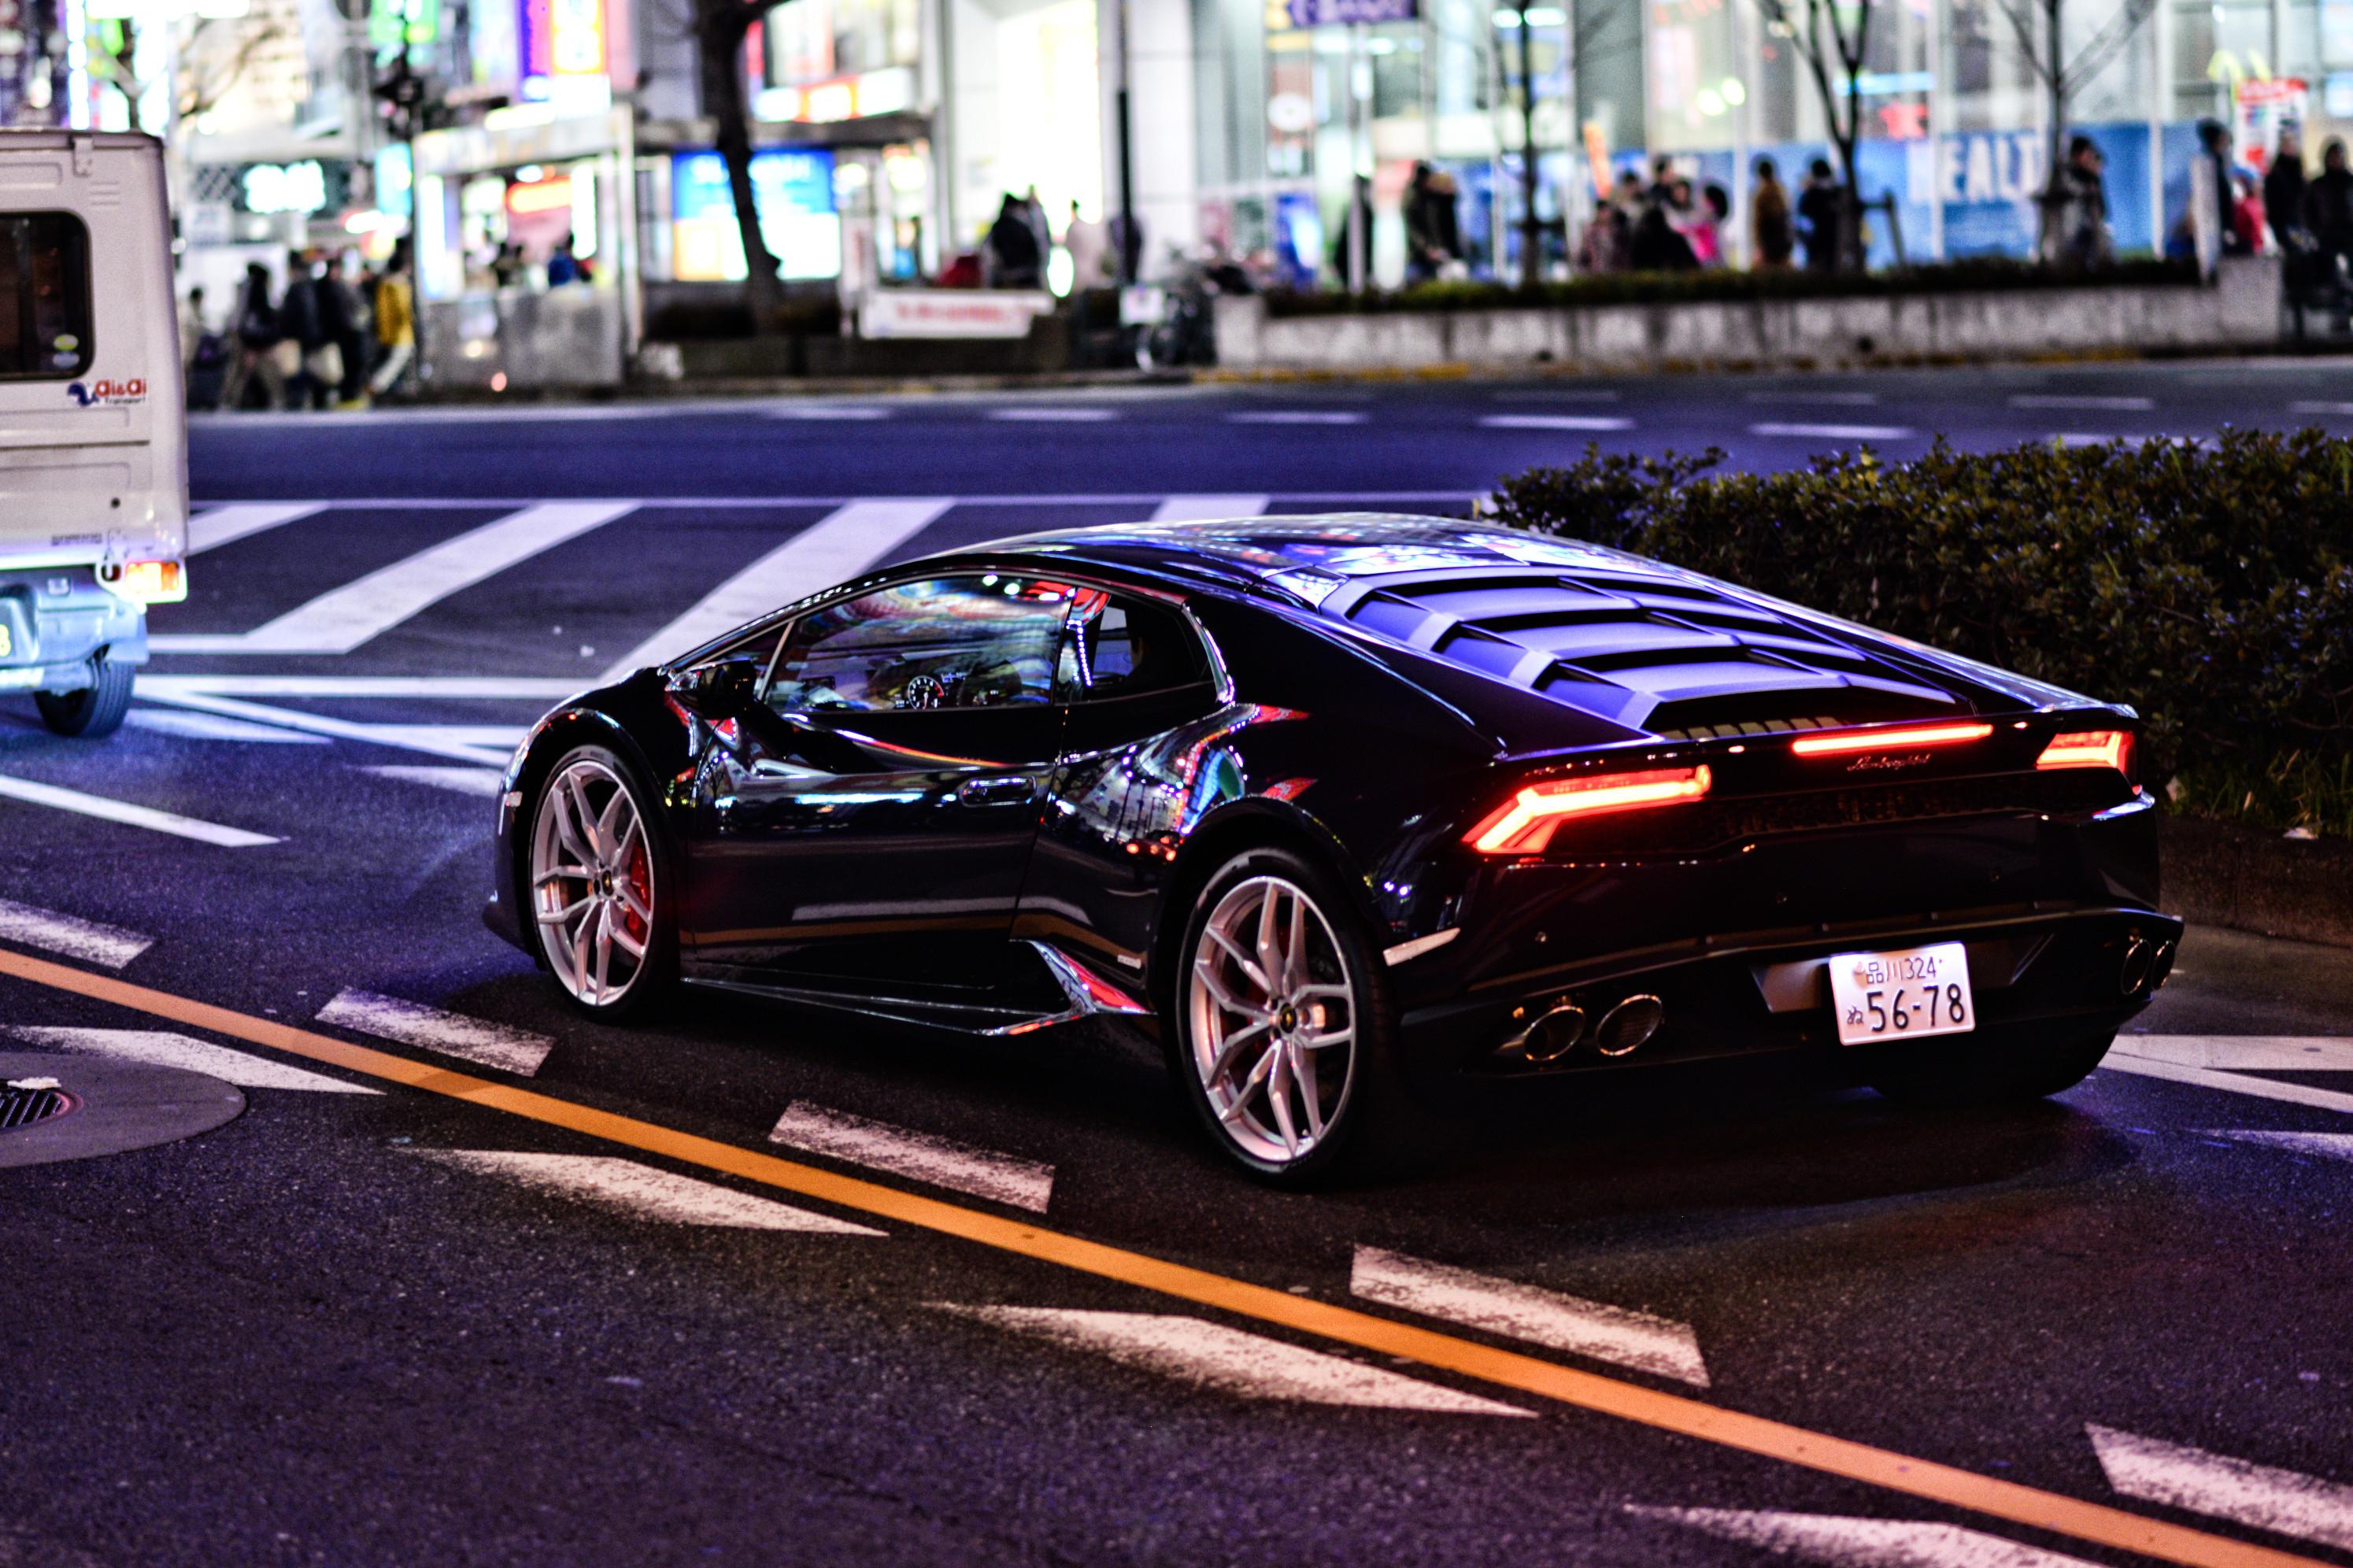 "<p><span>Lamborghini Huracan.&nbsp;</span>Фото: &copy; Flickr/<a href=""https://www.flickr.com/photos/sinkdd/"" title=""Go to sinkdd's photostream"" data-track=""attributionNameClick"" data-rapid_p=""55"">sinkdd</a></p>"